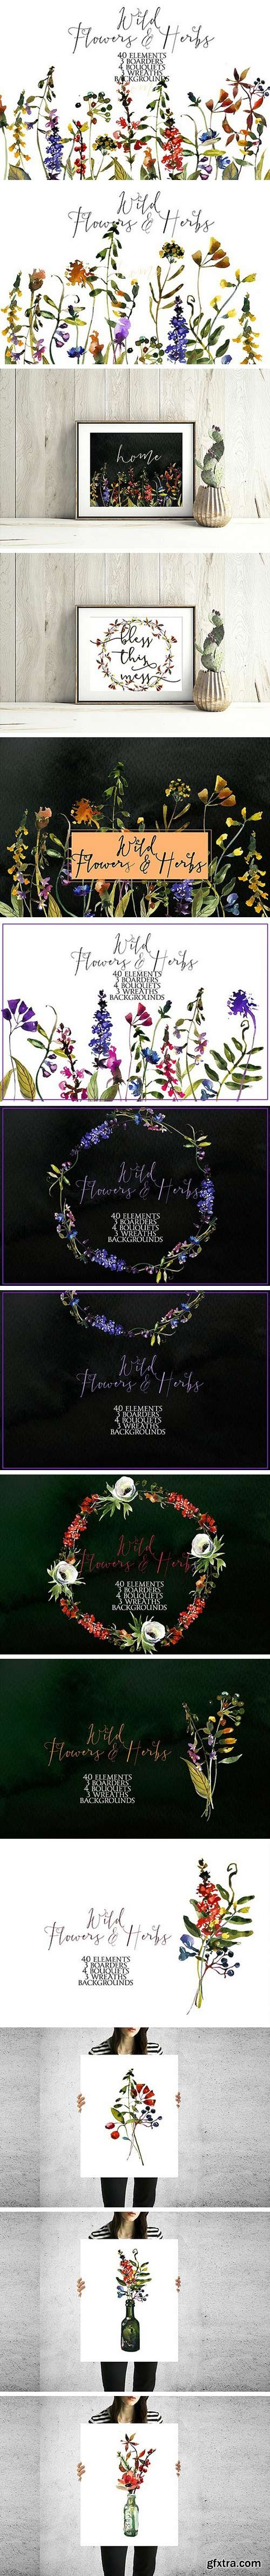 Wild Flowers & Herbs Watercolor Set